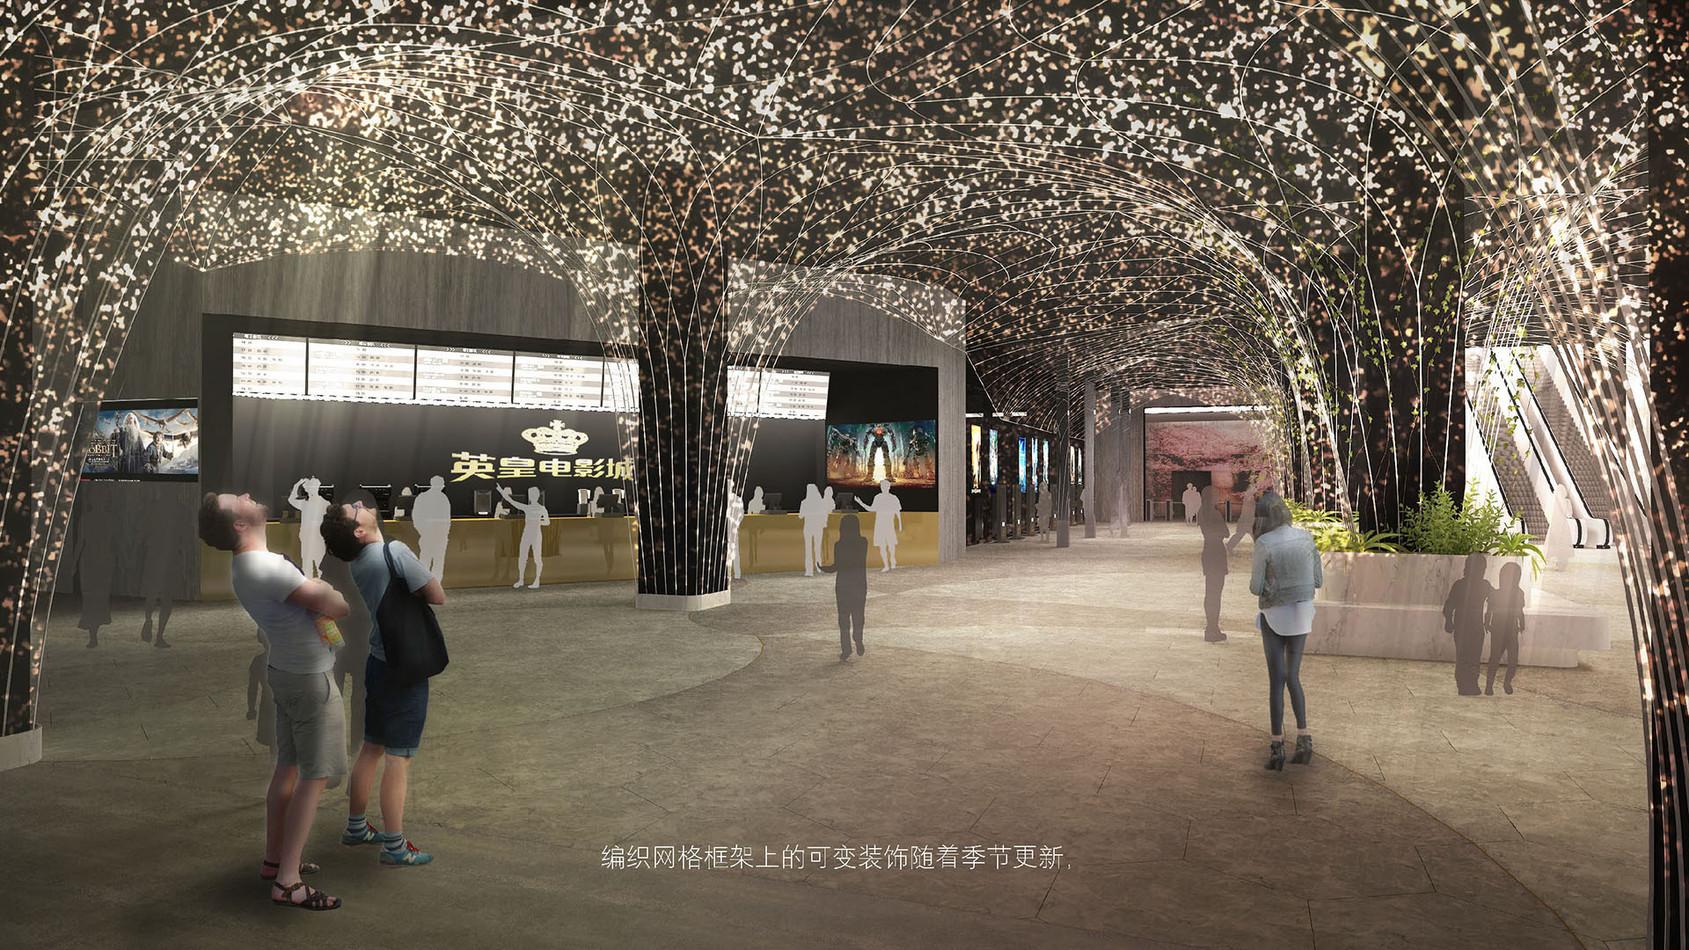 CHONGQING-EMPEROR-CINEMA-ZH 05.jpg